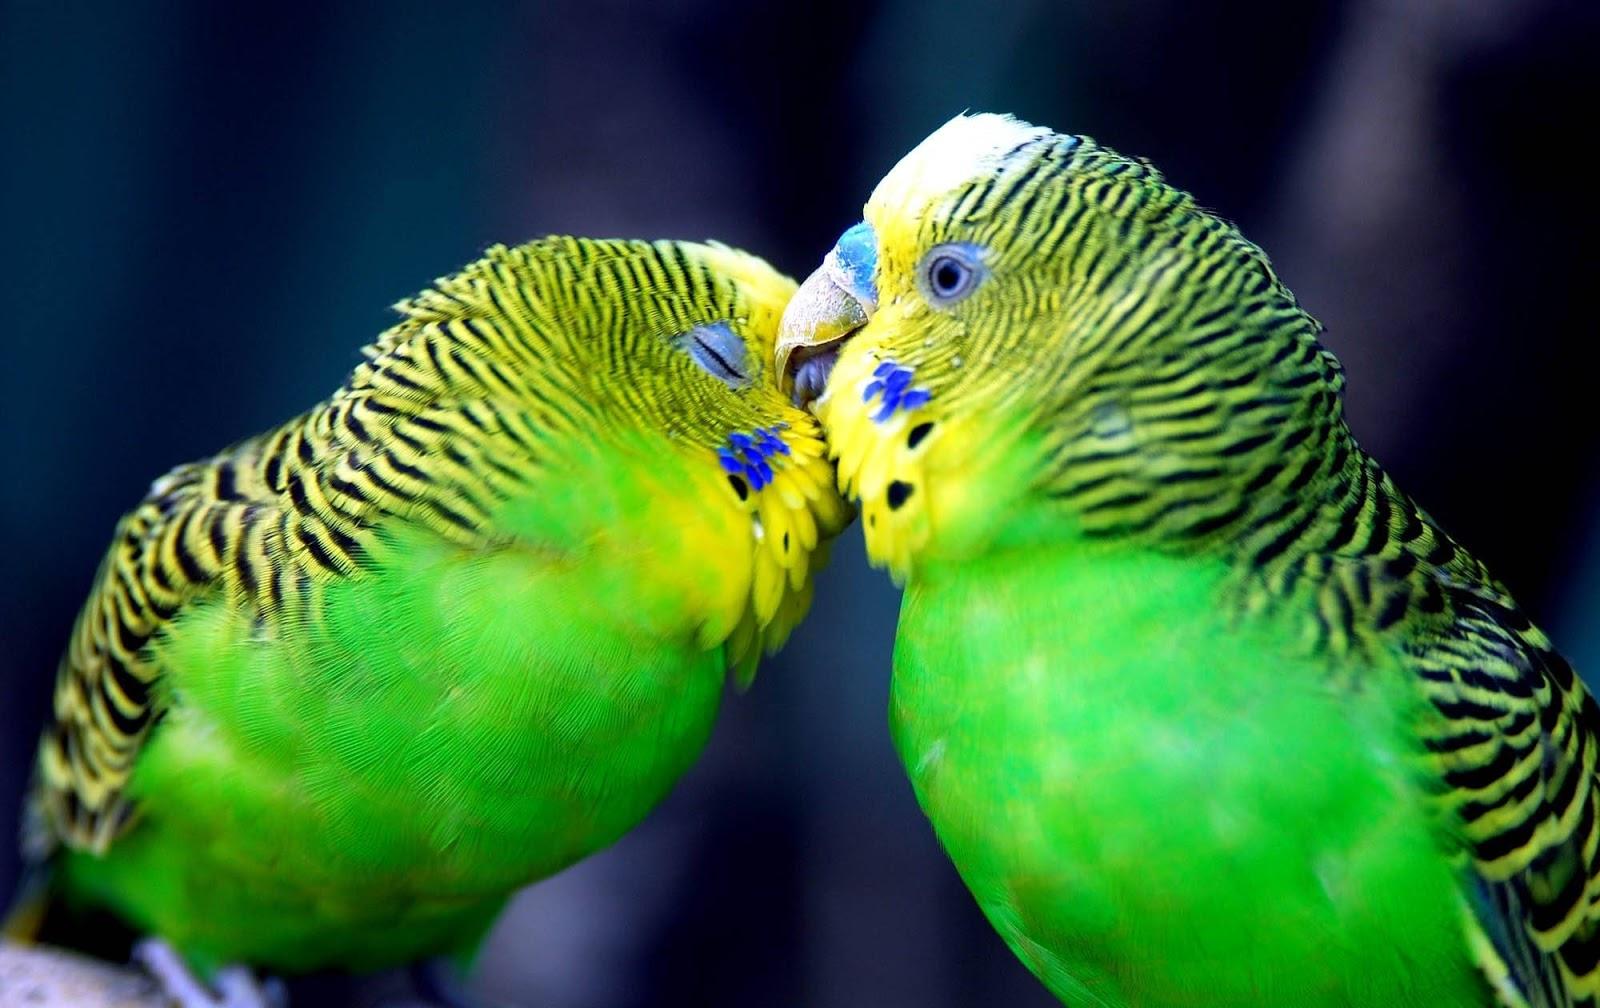 Top Wallpaper Love Parrot - Beautiful%2BCute%2BParrots%2BKissing%2BRomantic%2BHD%2BWallpapers  You Should Have_188423.jpg